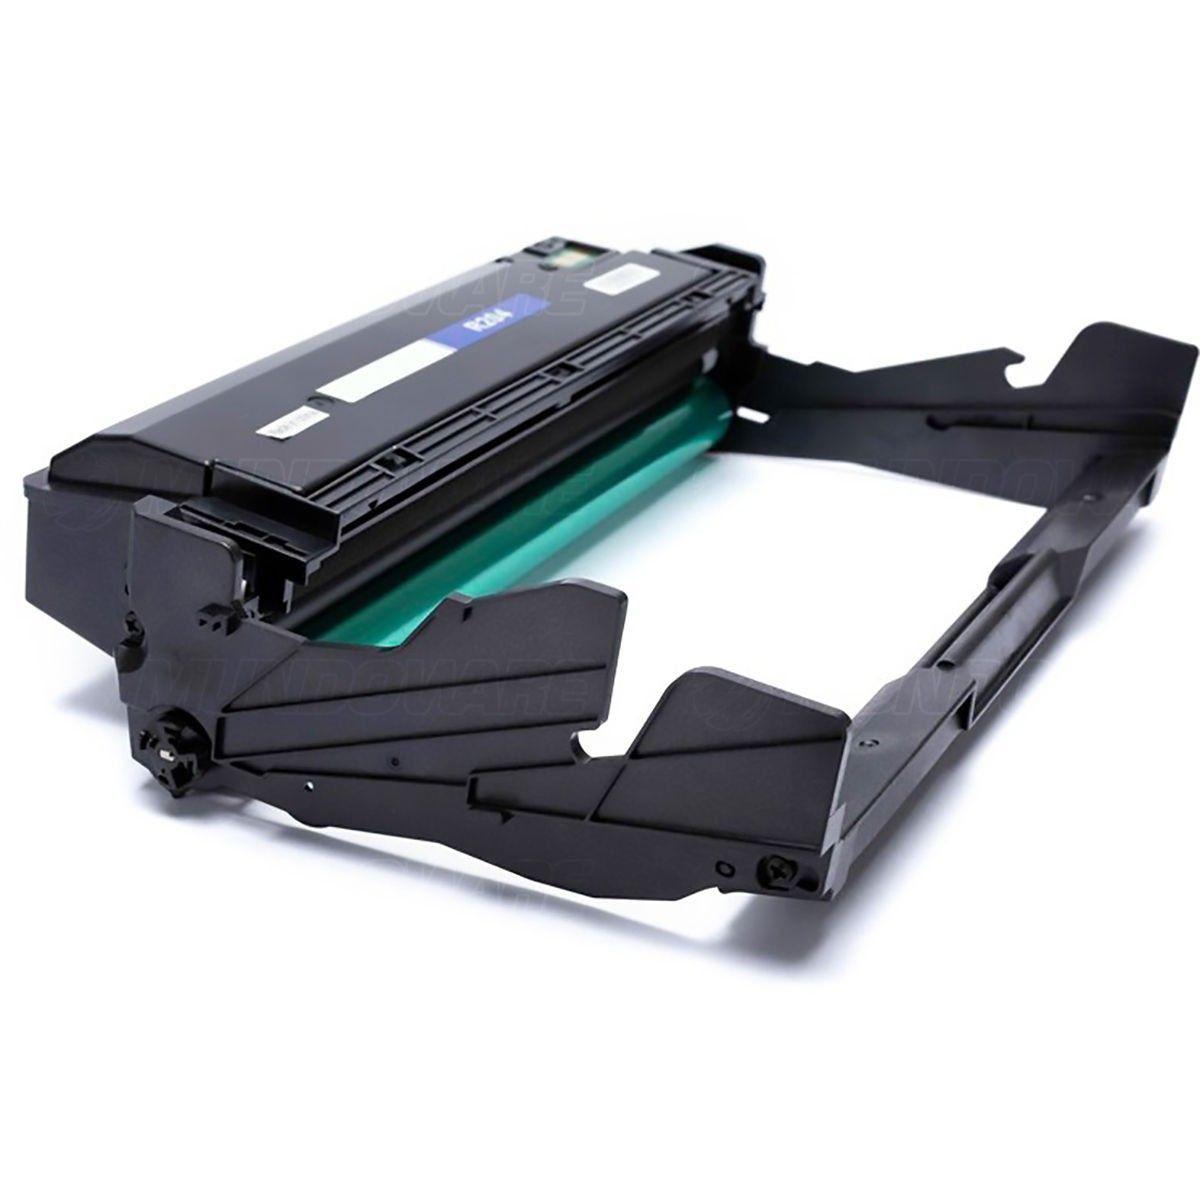 Compatível: Cartucho de Cilindro R204 DR204 para Samsung M3325 M3825 M4025 M3375 M3875 M4075 M3325nd M4025nd / 30.000